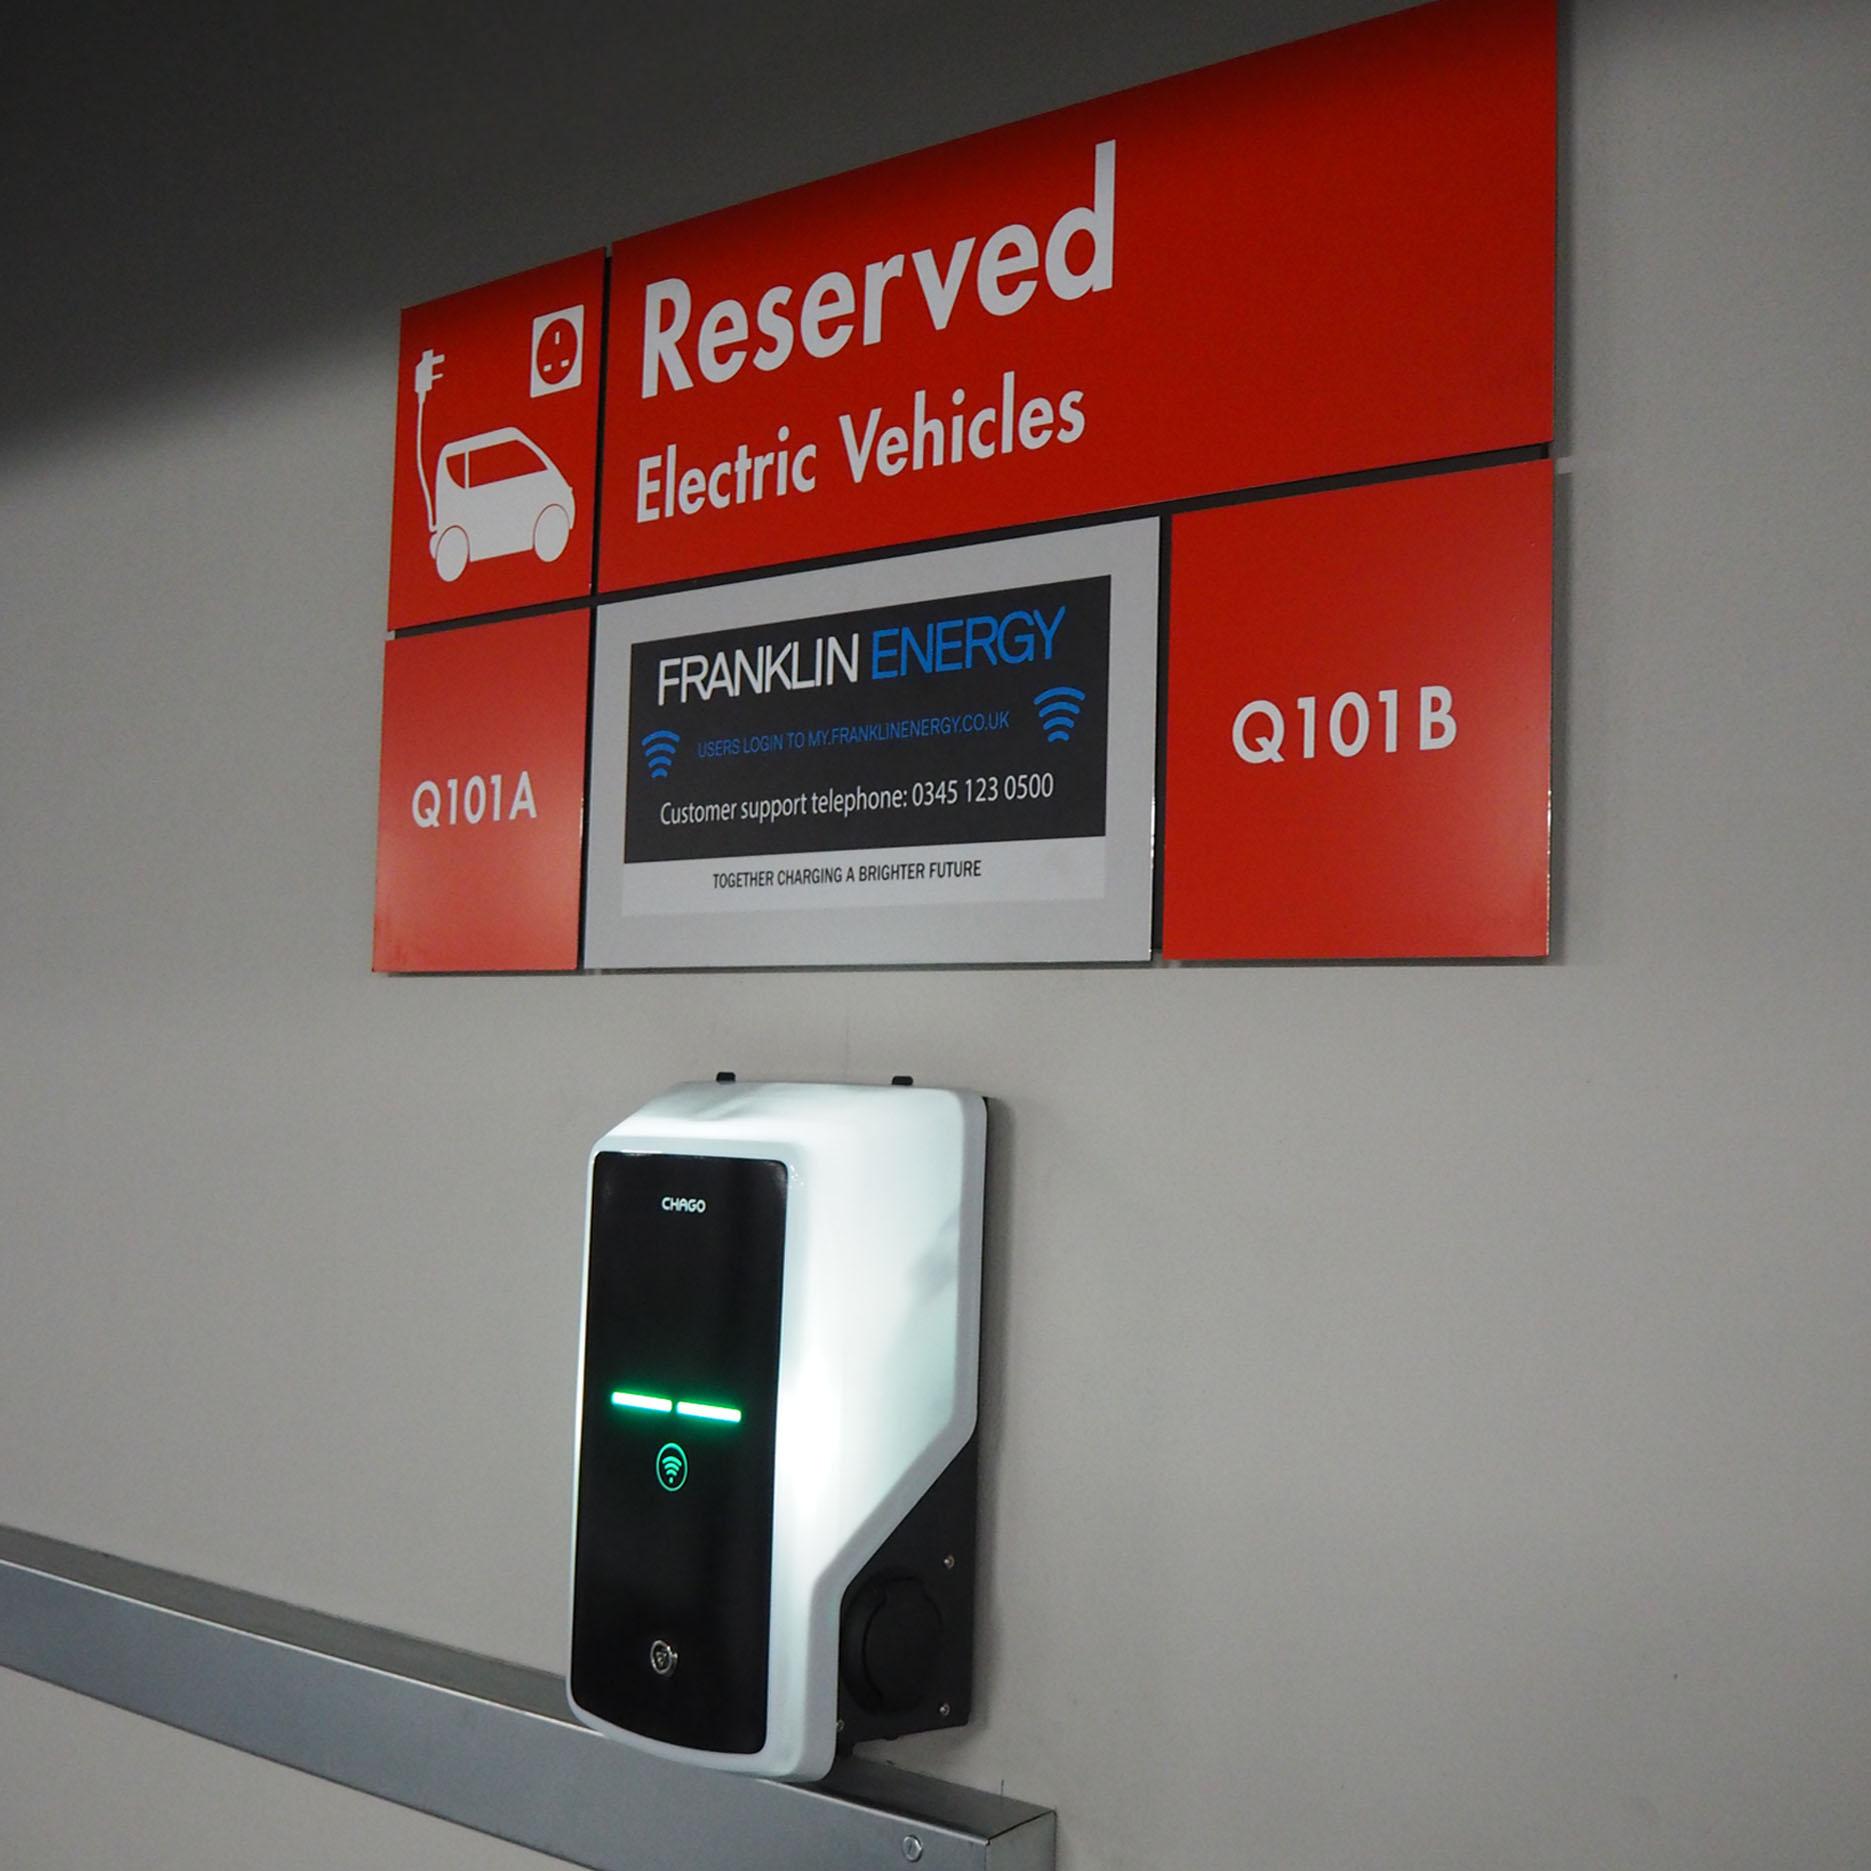 EV reserved